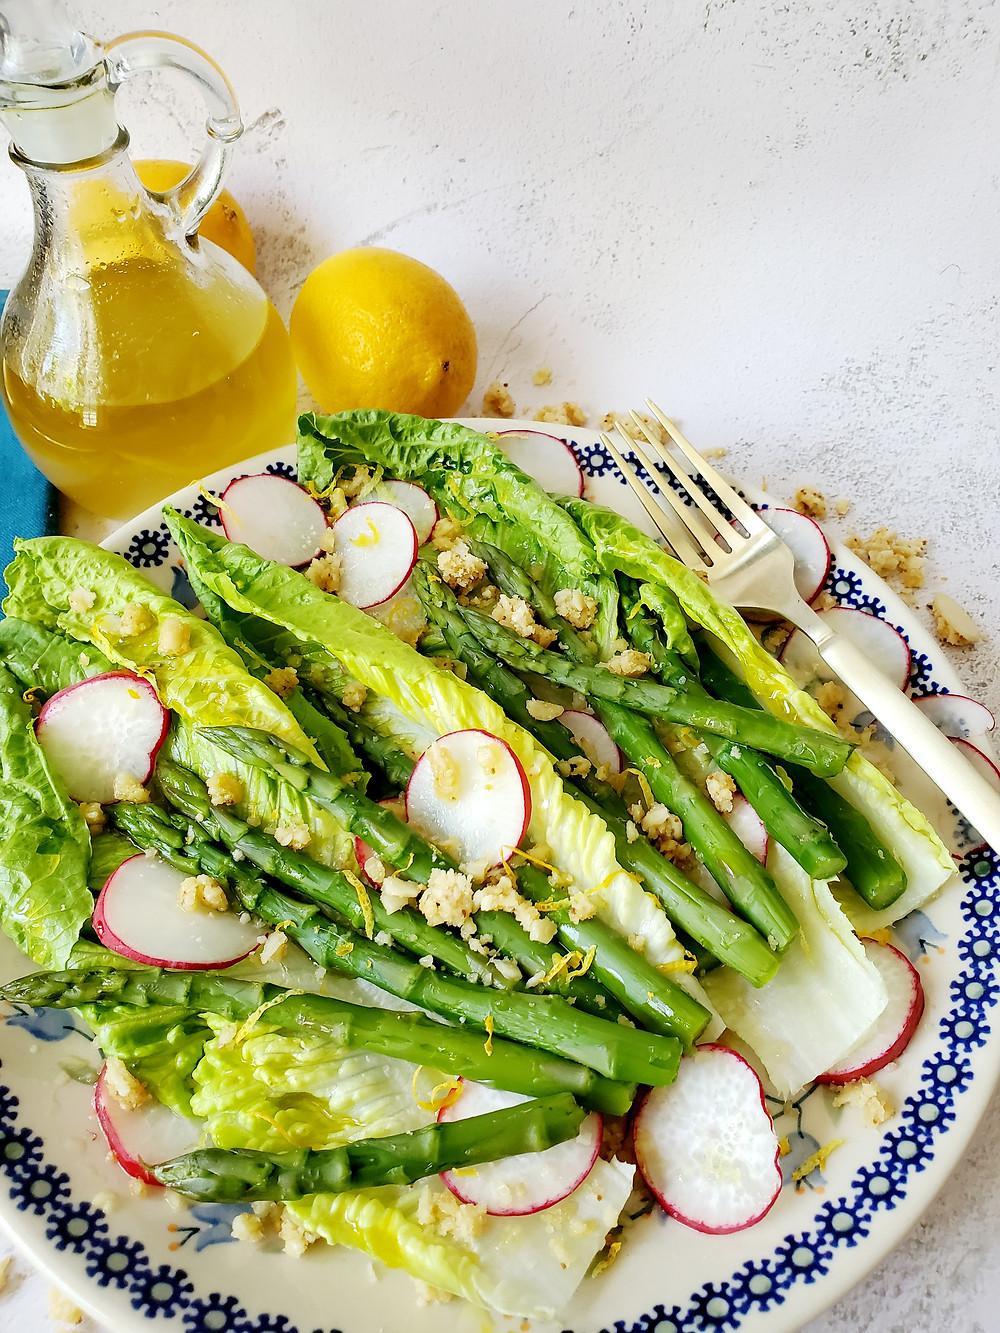 Spring Asparagus Salad With Lemon Vinaigrette - Keto | Low Cab | Gluten-Free